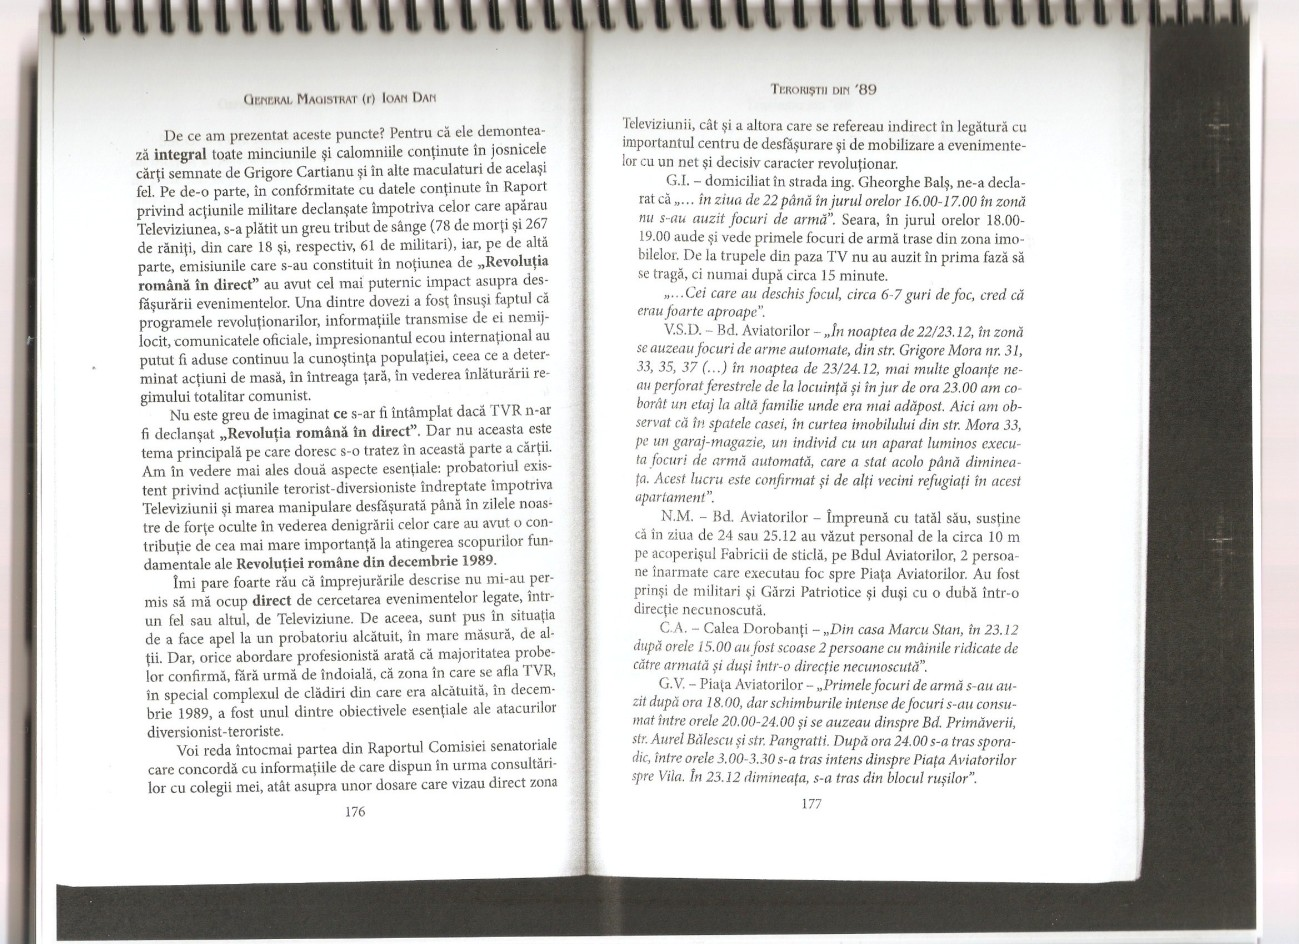 https://romanianrevolutionofdecember1989.files.wordpress.com/2013/12/image0-001-e1385914425878.jpg?w=1299&h=944